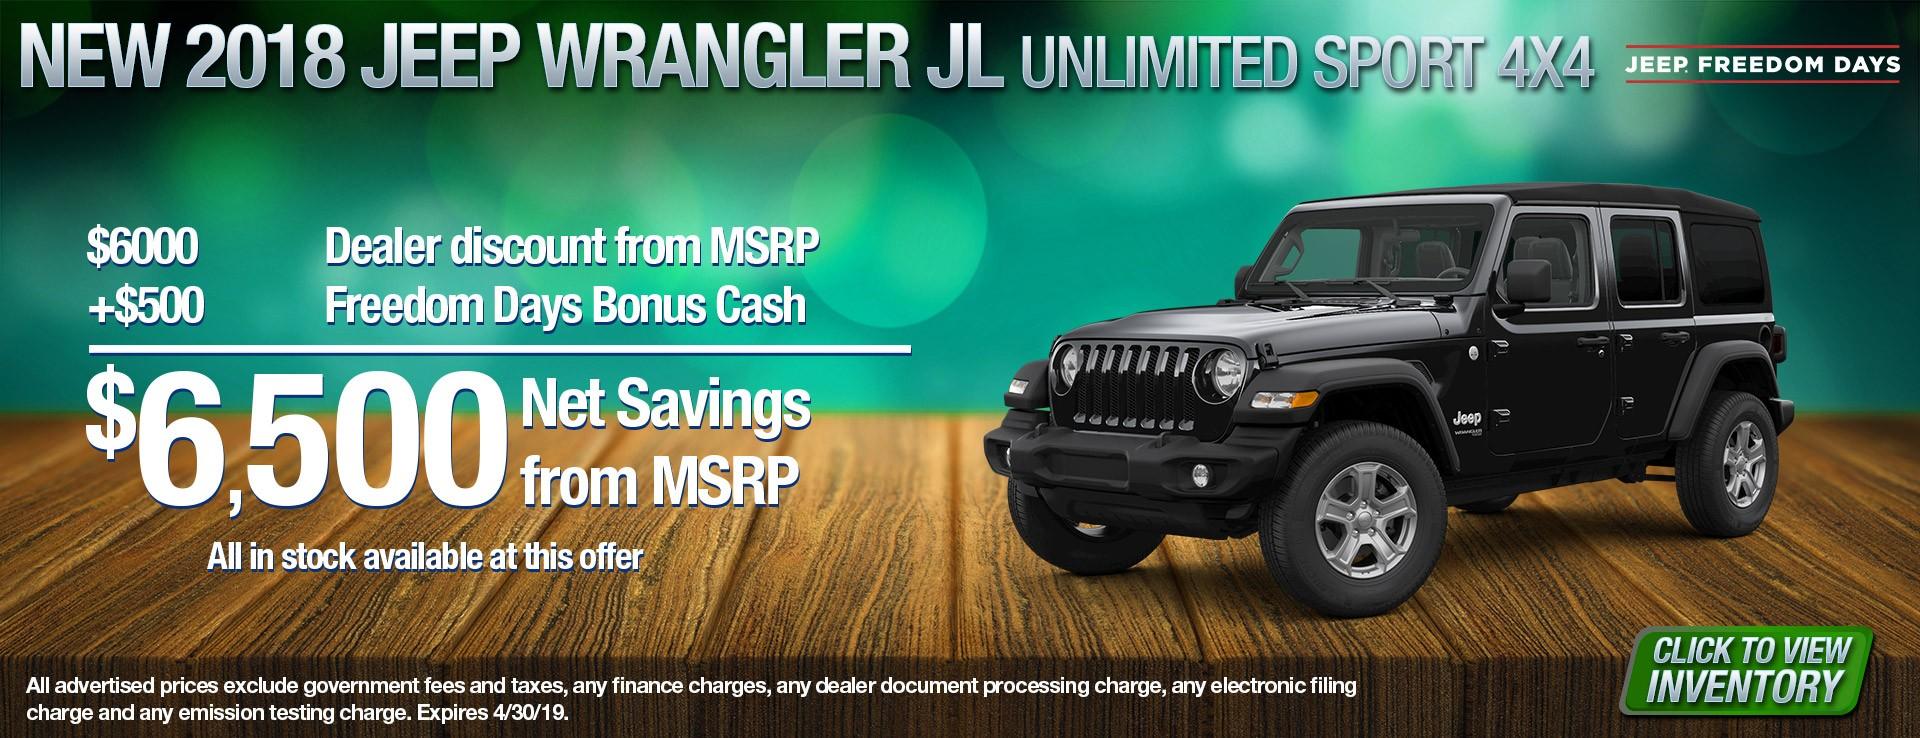 18 Jeep Wrangler JL